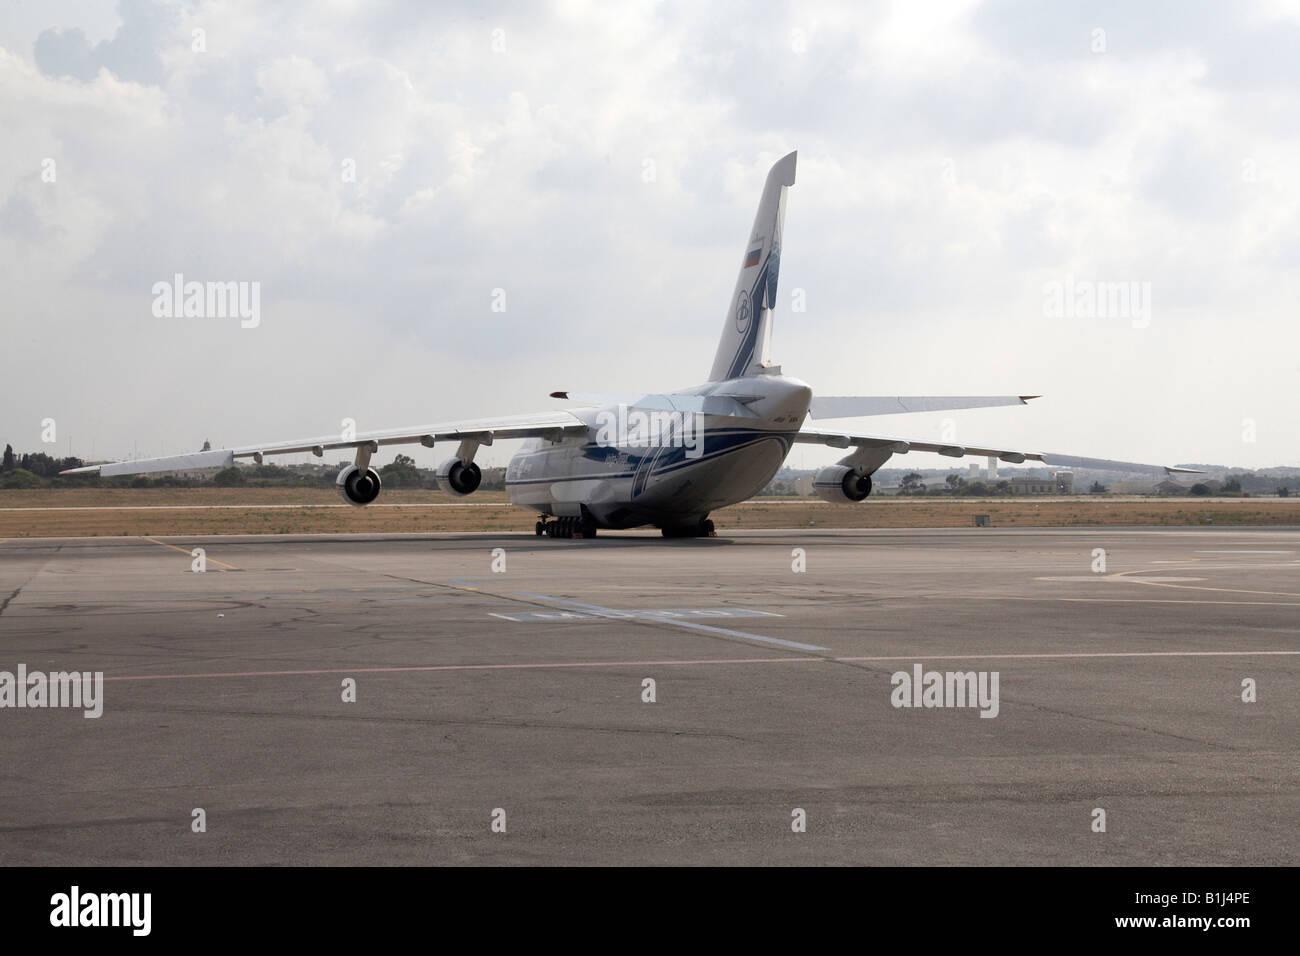 Volga Dnepr Russian Antonov AN 124 100 aircraft on apron at airport in Malta International Airport Stock Photo